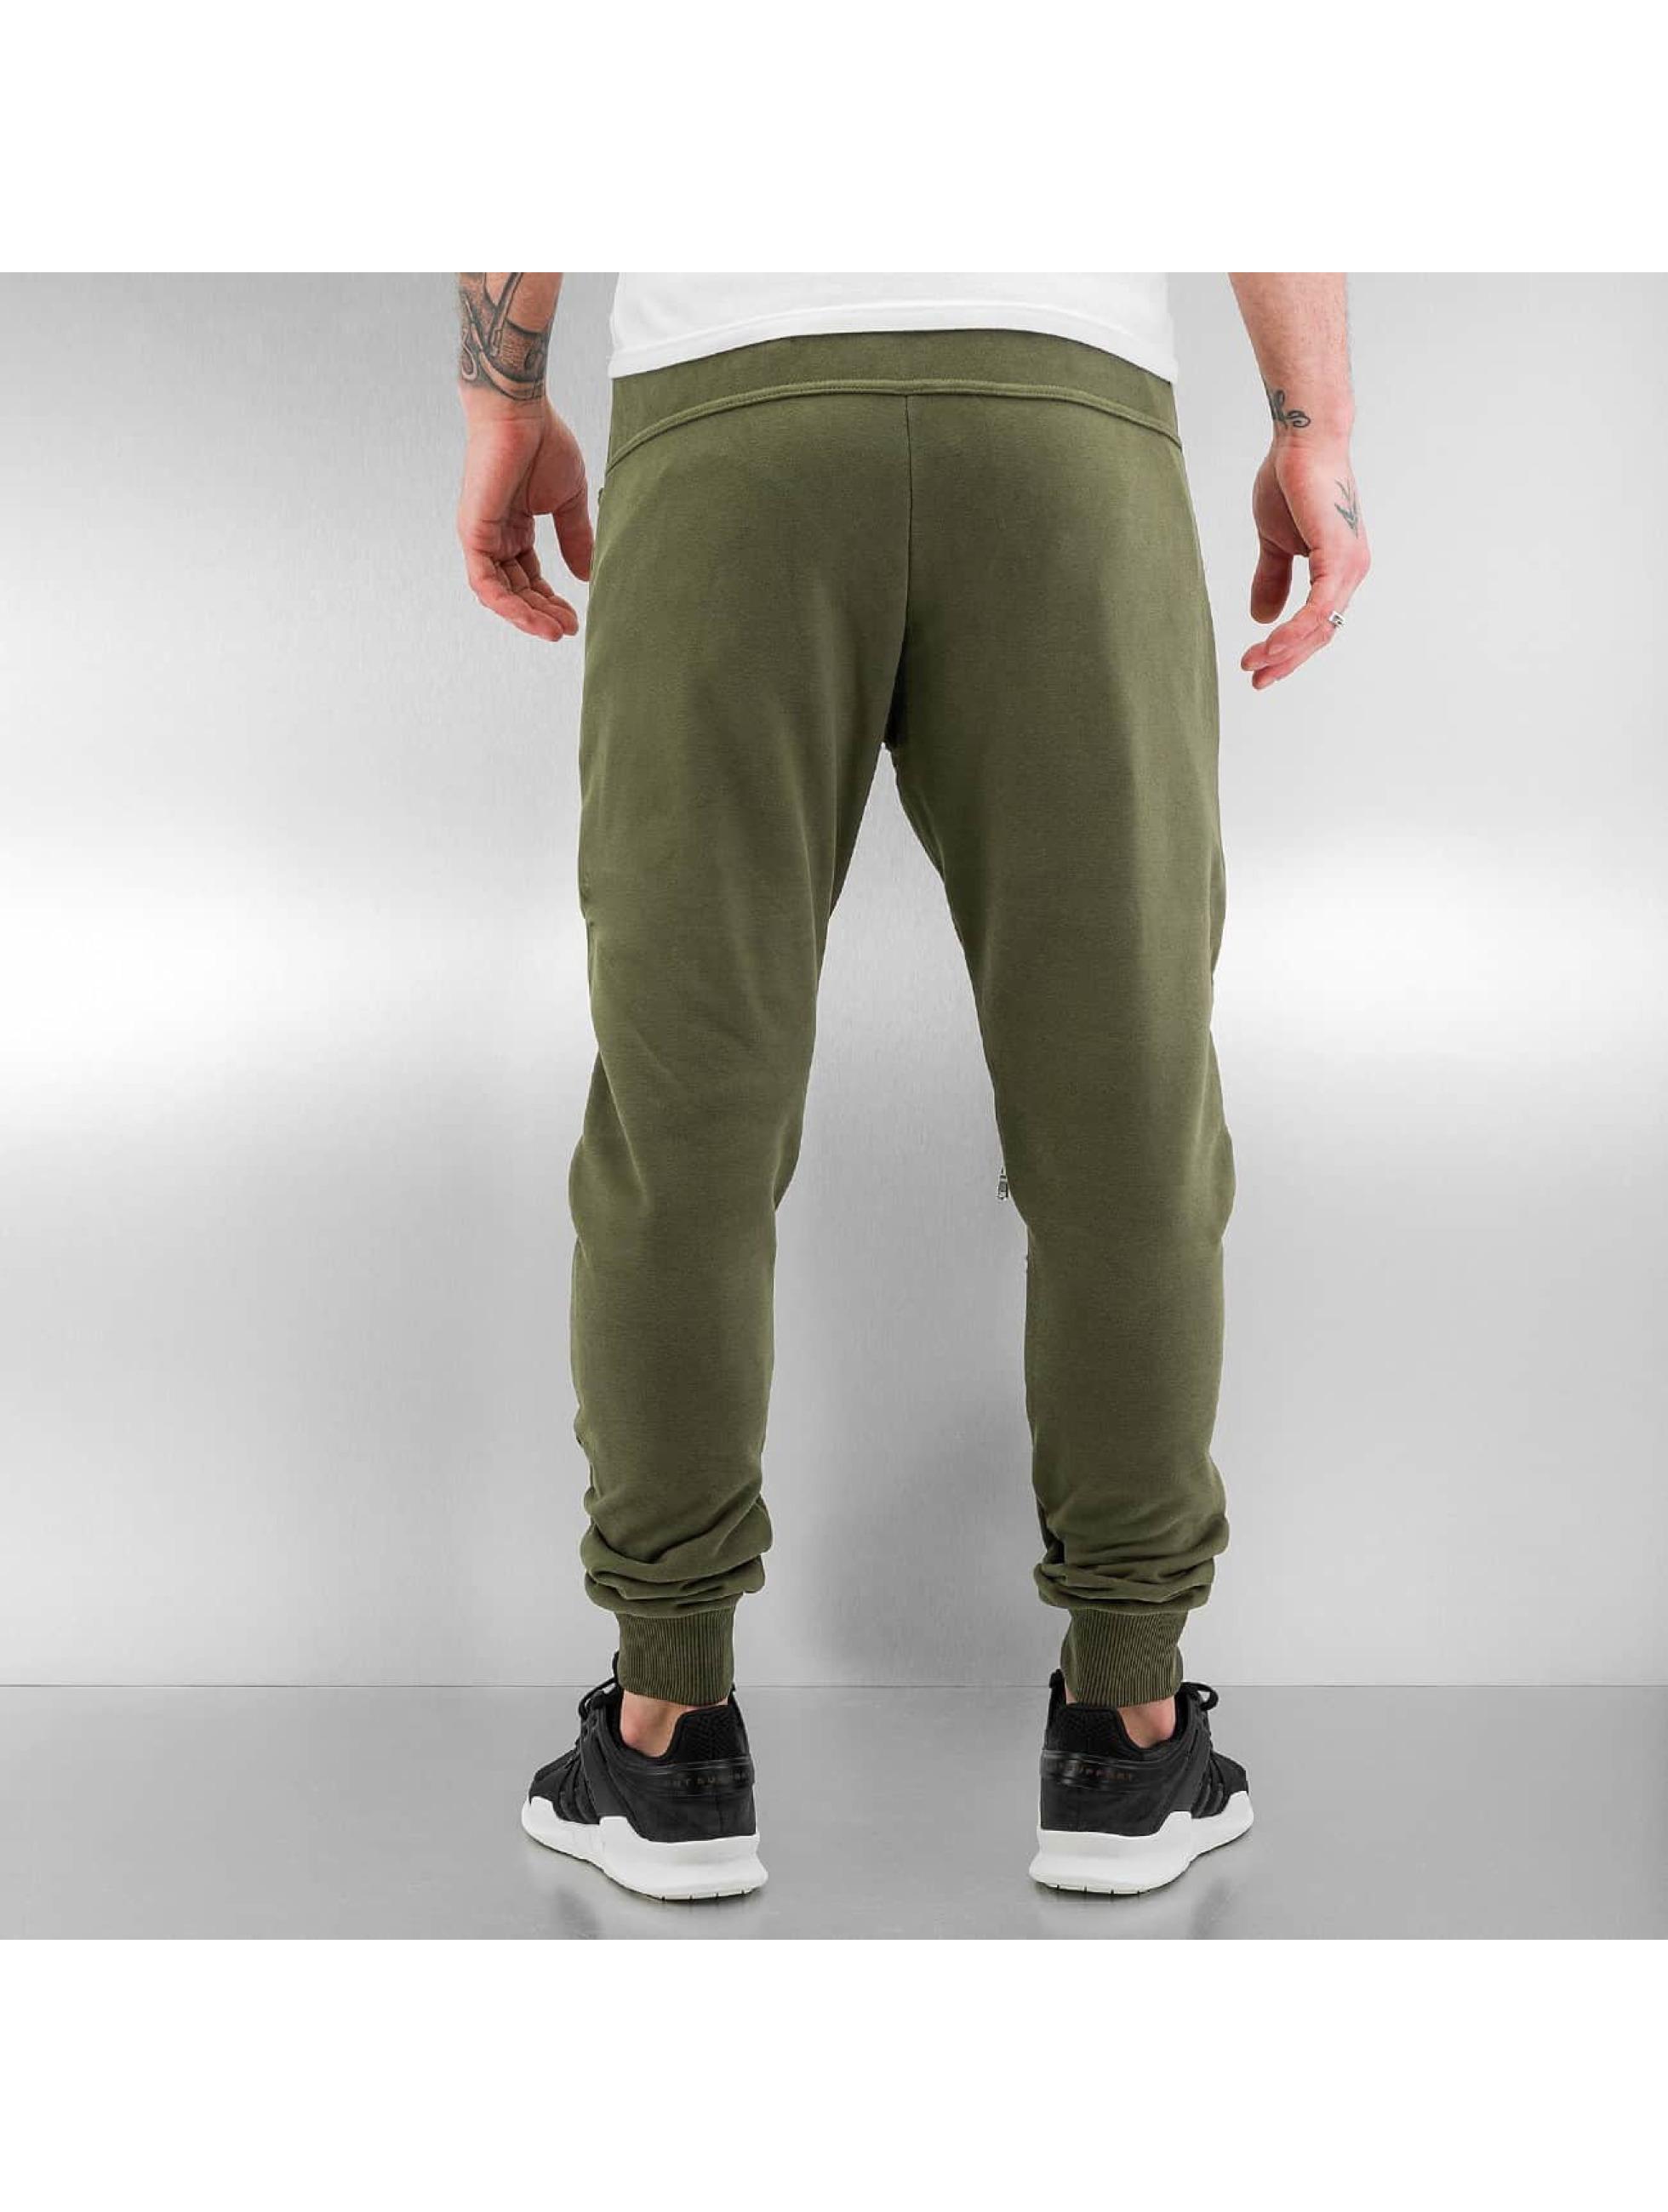 2Y Joggingbukser Zip khaki